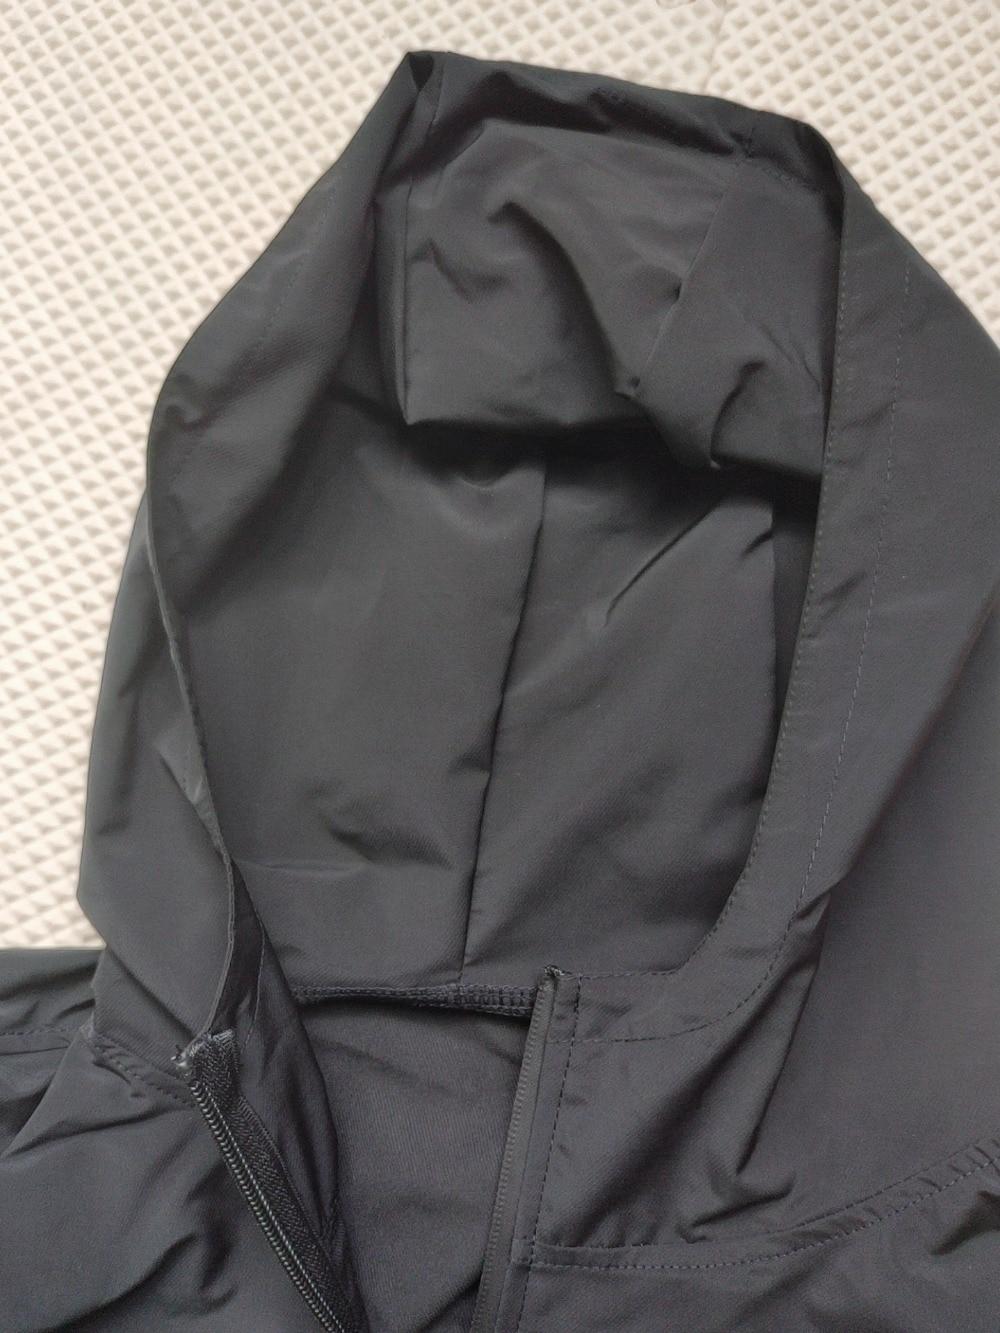 de secagem rápida casaco windbreaker caça roupas